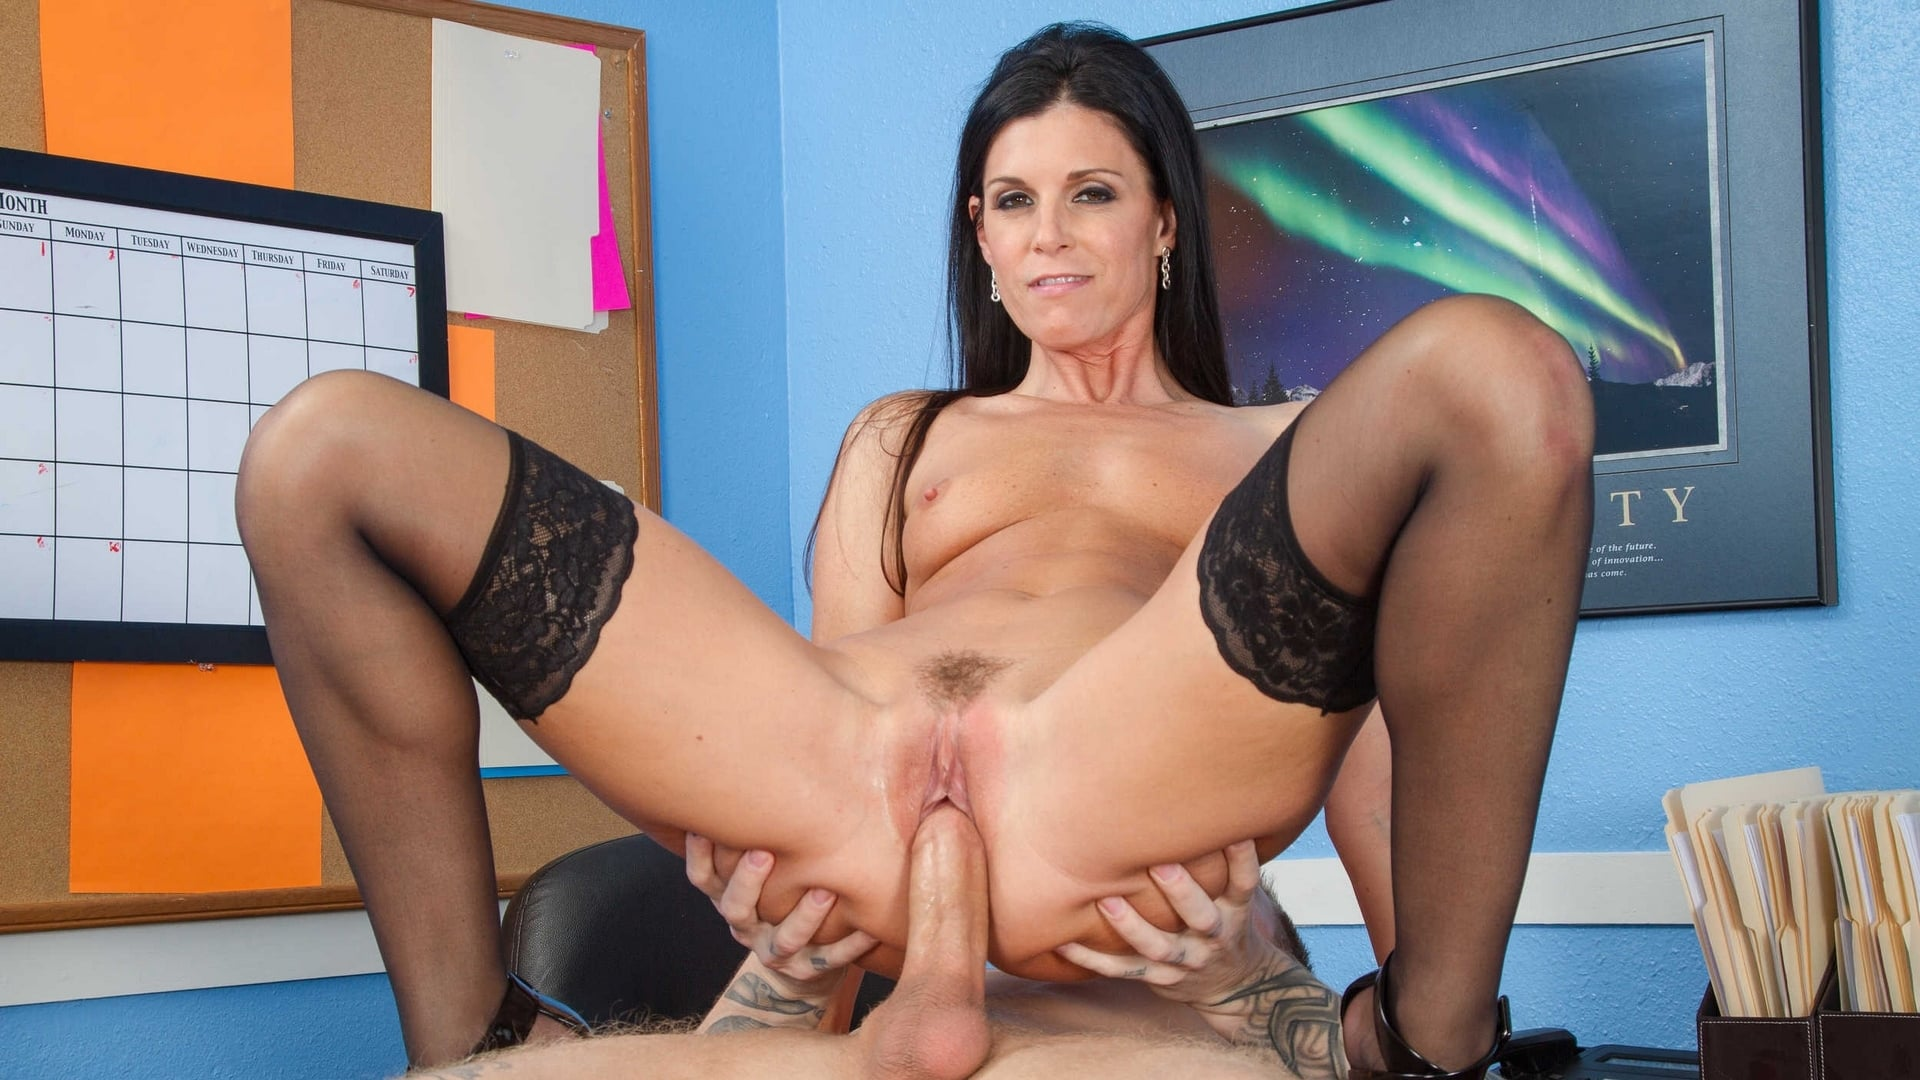 Summer brielle in my first sex teacher